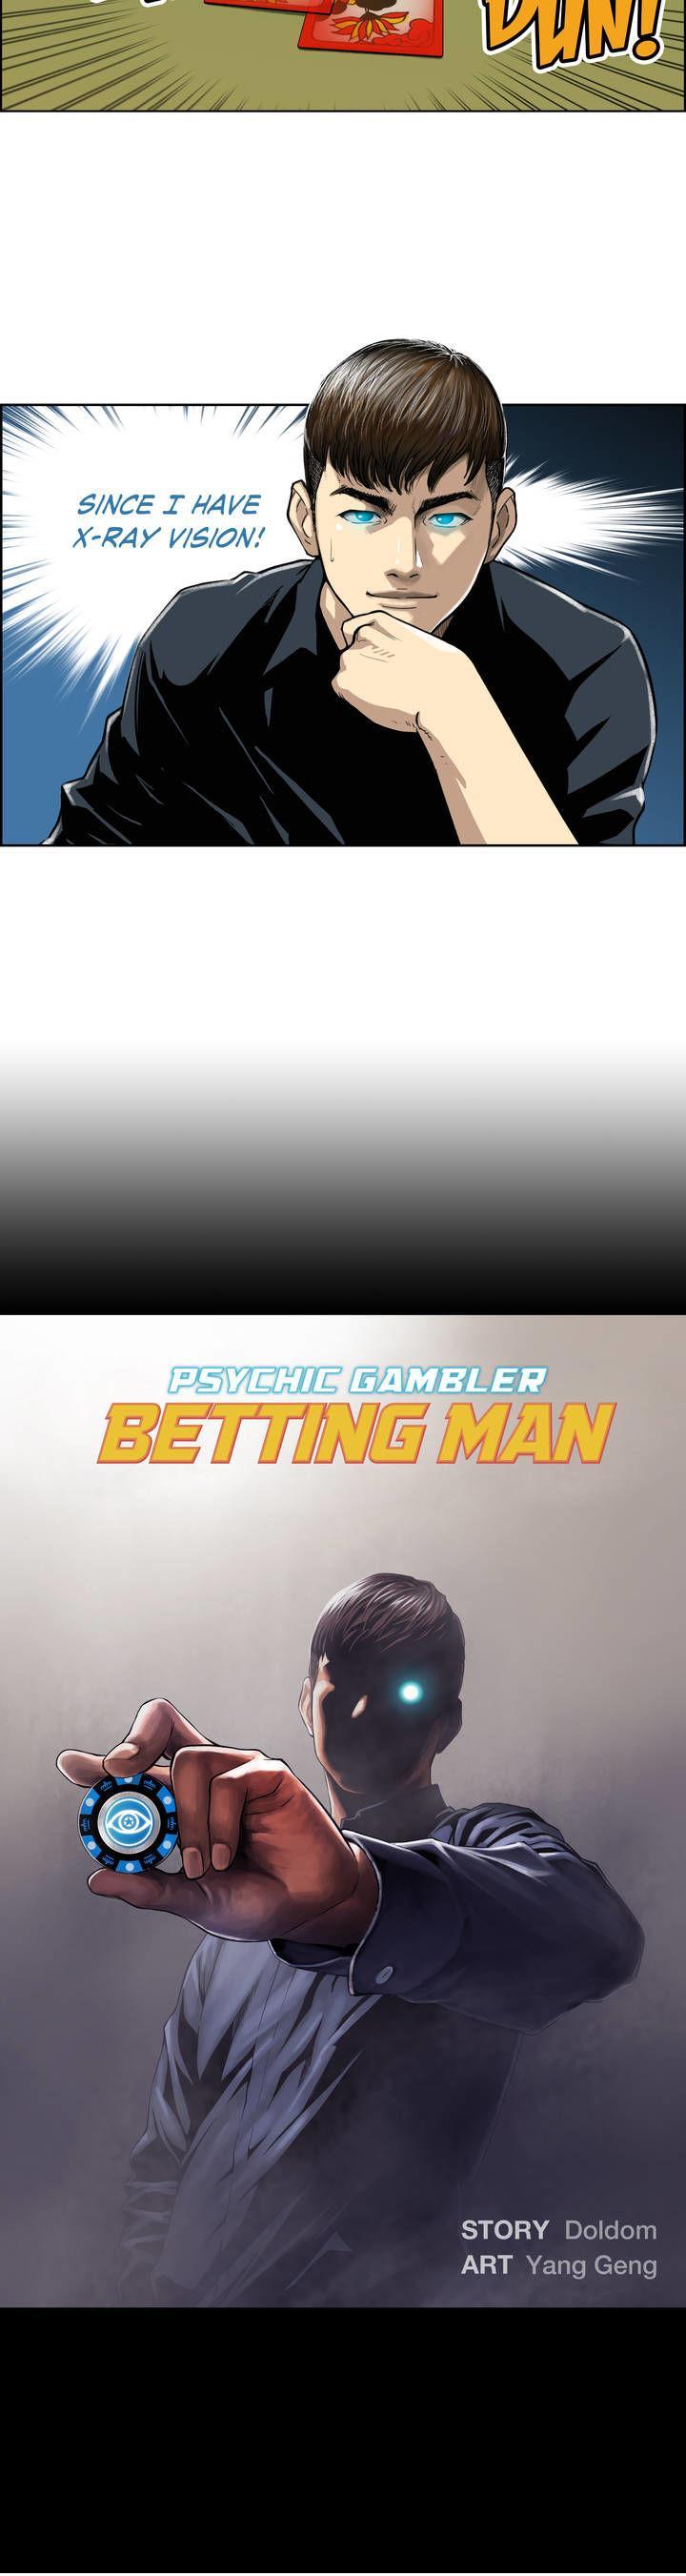 Psychic Gambler: Betting Man - Chapter 1